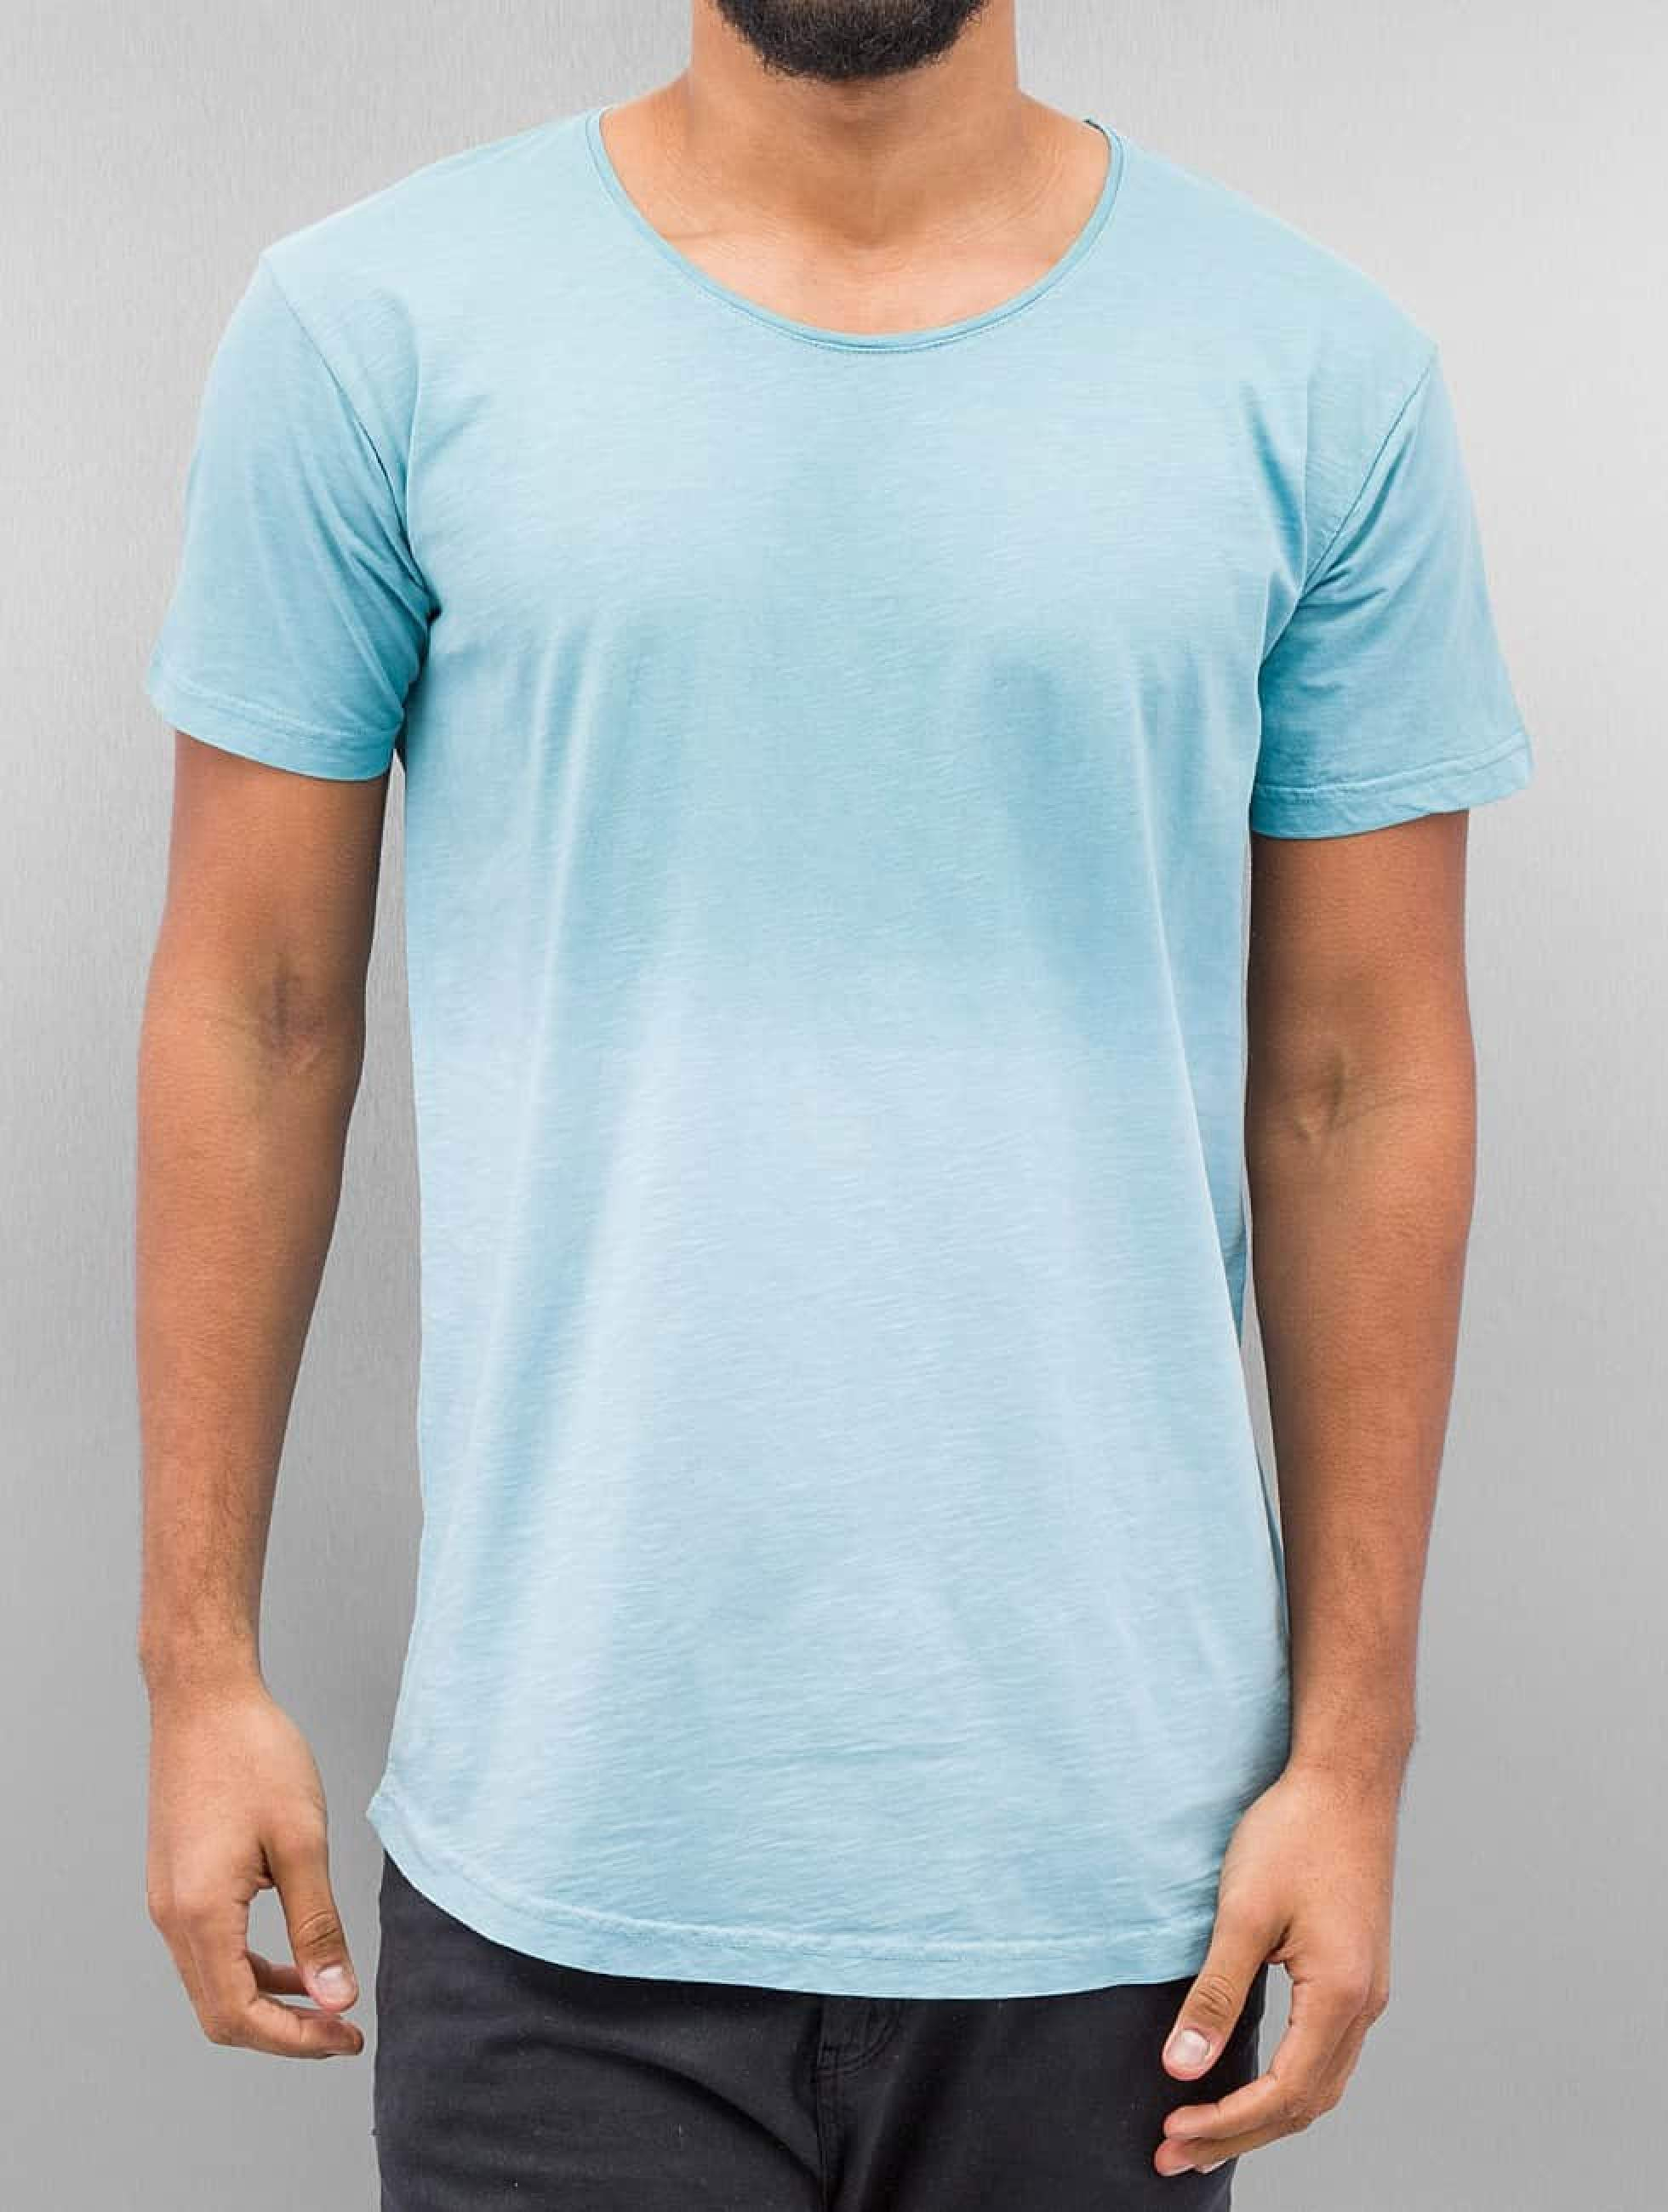 Just Rhyse / T-Shirt Batik in blue S